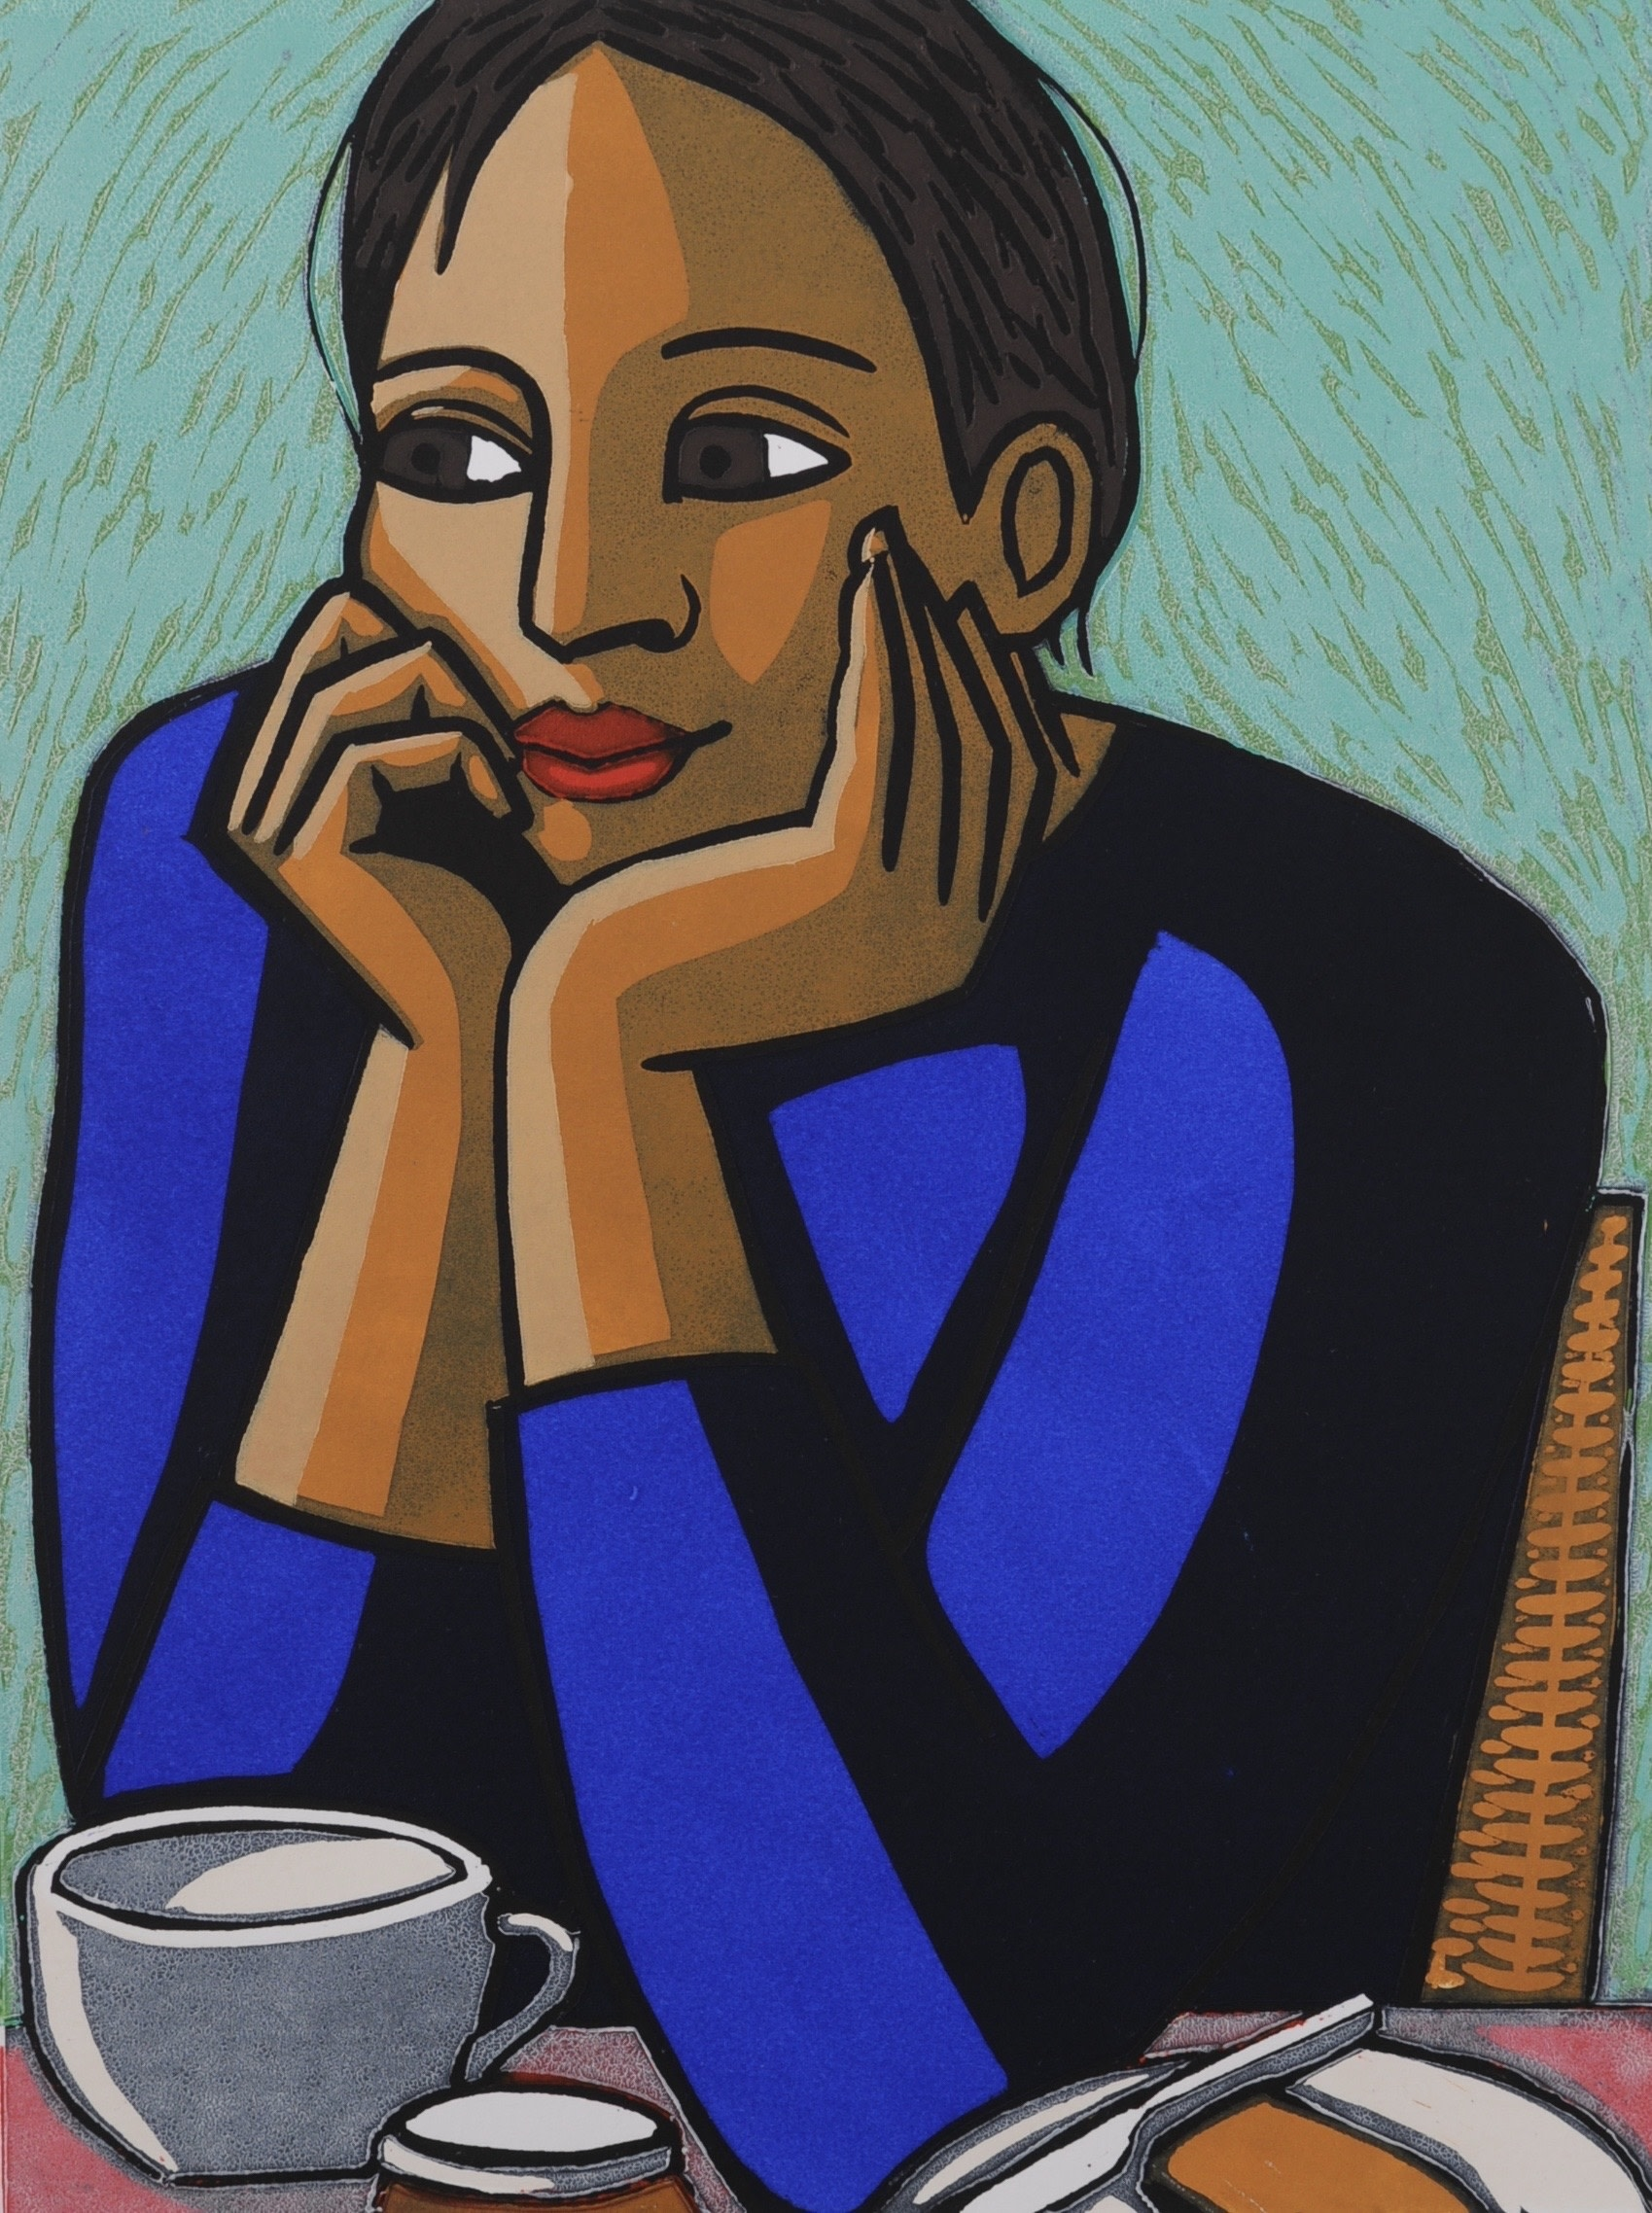 "<span class=""link fancybox-details-link""><a href=""/artists/139-anita-klein-ppre-hon-rws/works/10373/"">View Detail Page</a></span><div class=""artist""><span class=""artist""><strong>Anita Klein PPRE Hon RWS</strong></span></div><div class=""title""><em>Breakfast</em></div><div class=""medium"">linocut</div><div class=""dimensions"">58 x 48cm framed size<br /> 40 x 30cm image size</div><div class=""edition_details"">edition of 50</div>"